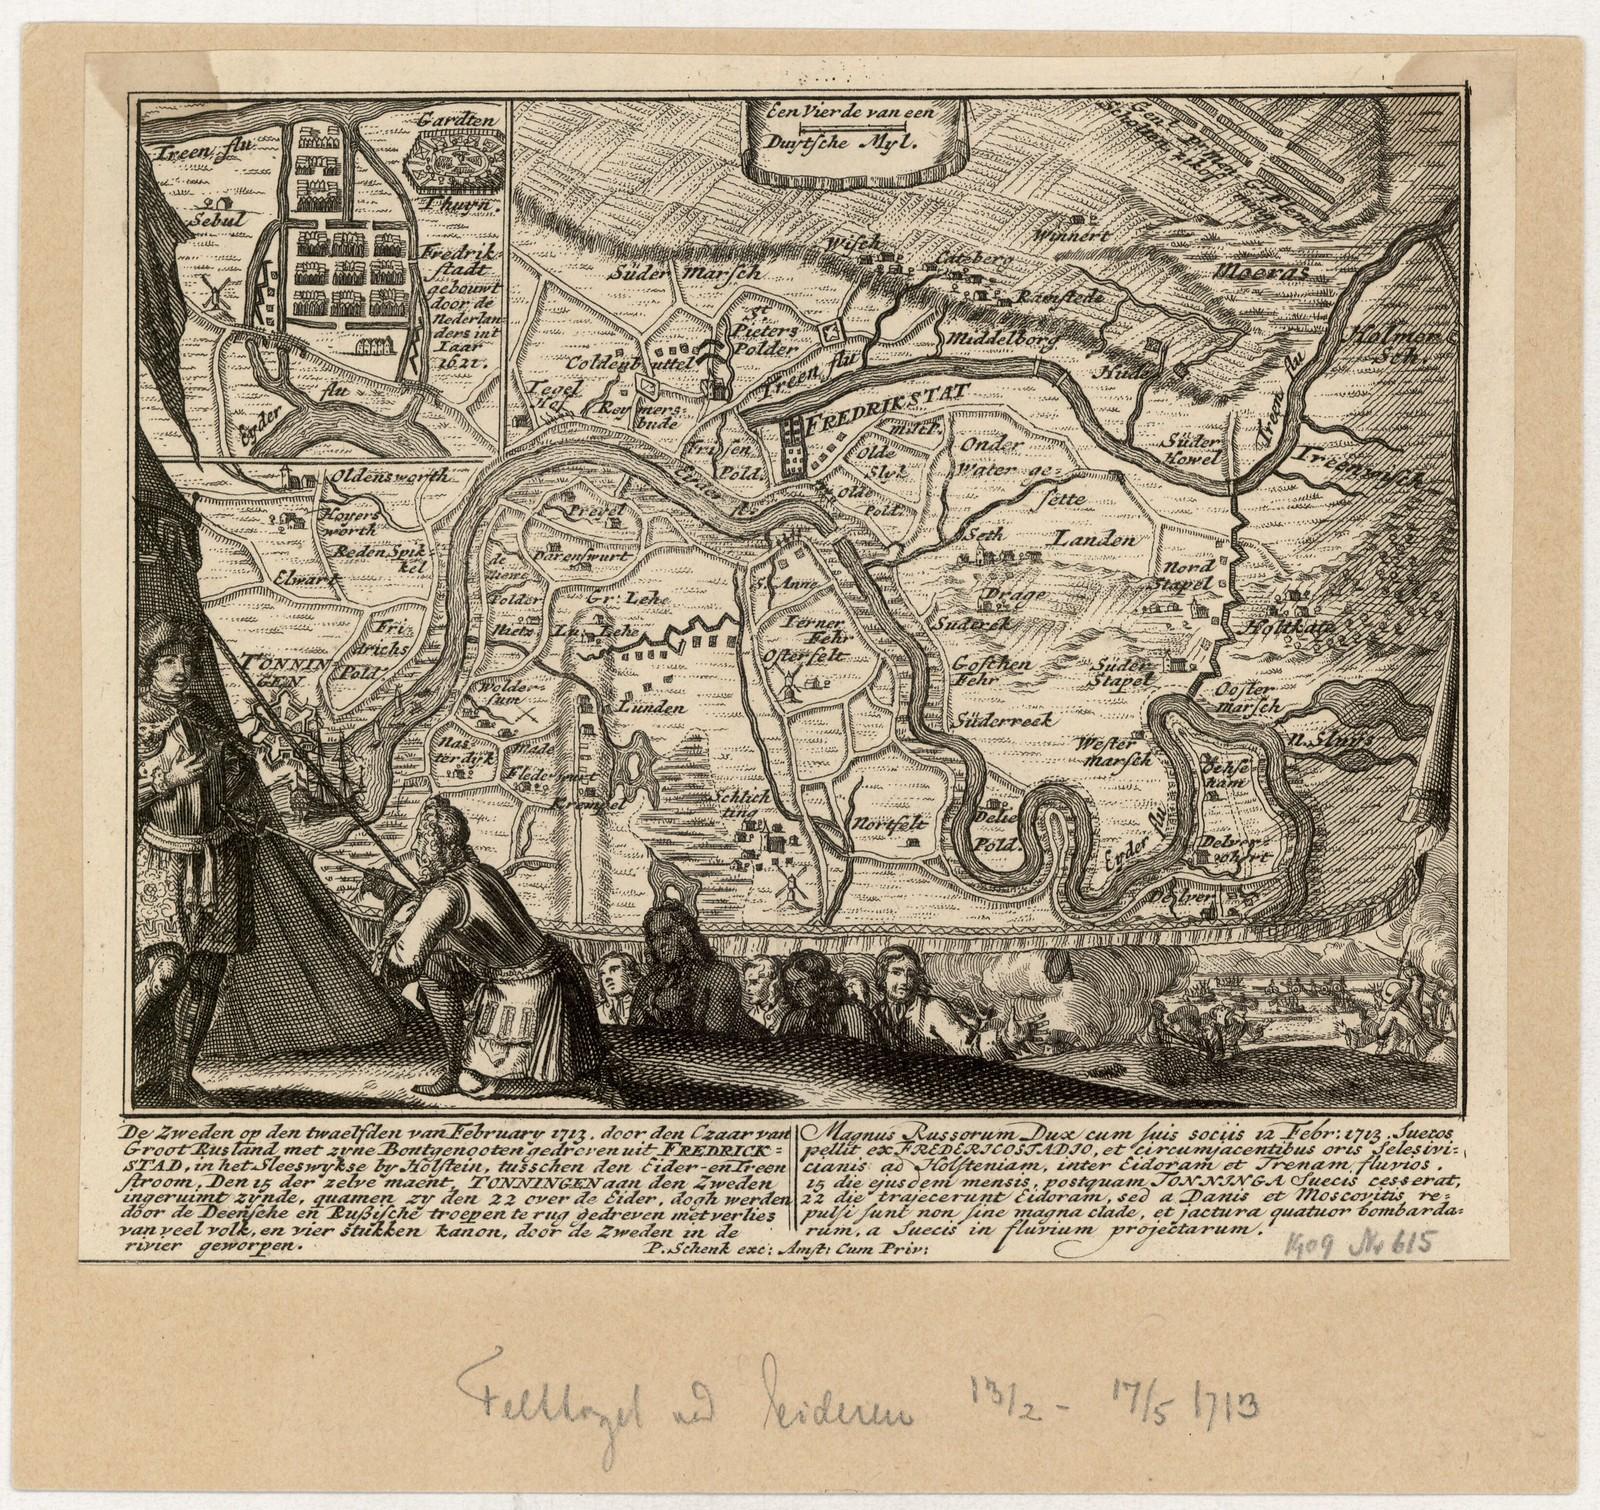 1713. Баталия при Фридрихштадте. 12 февраля